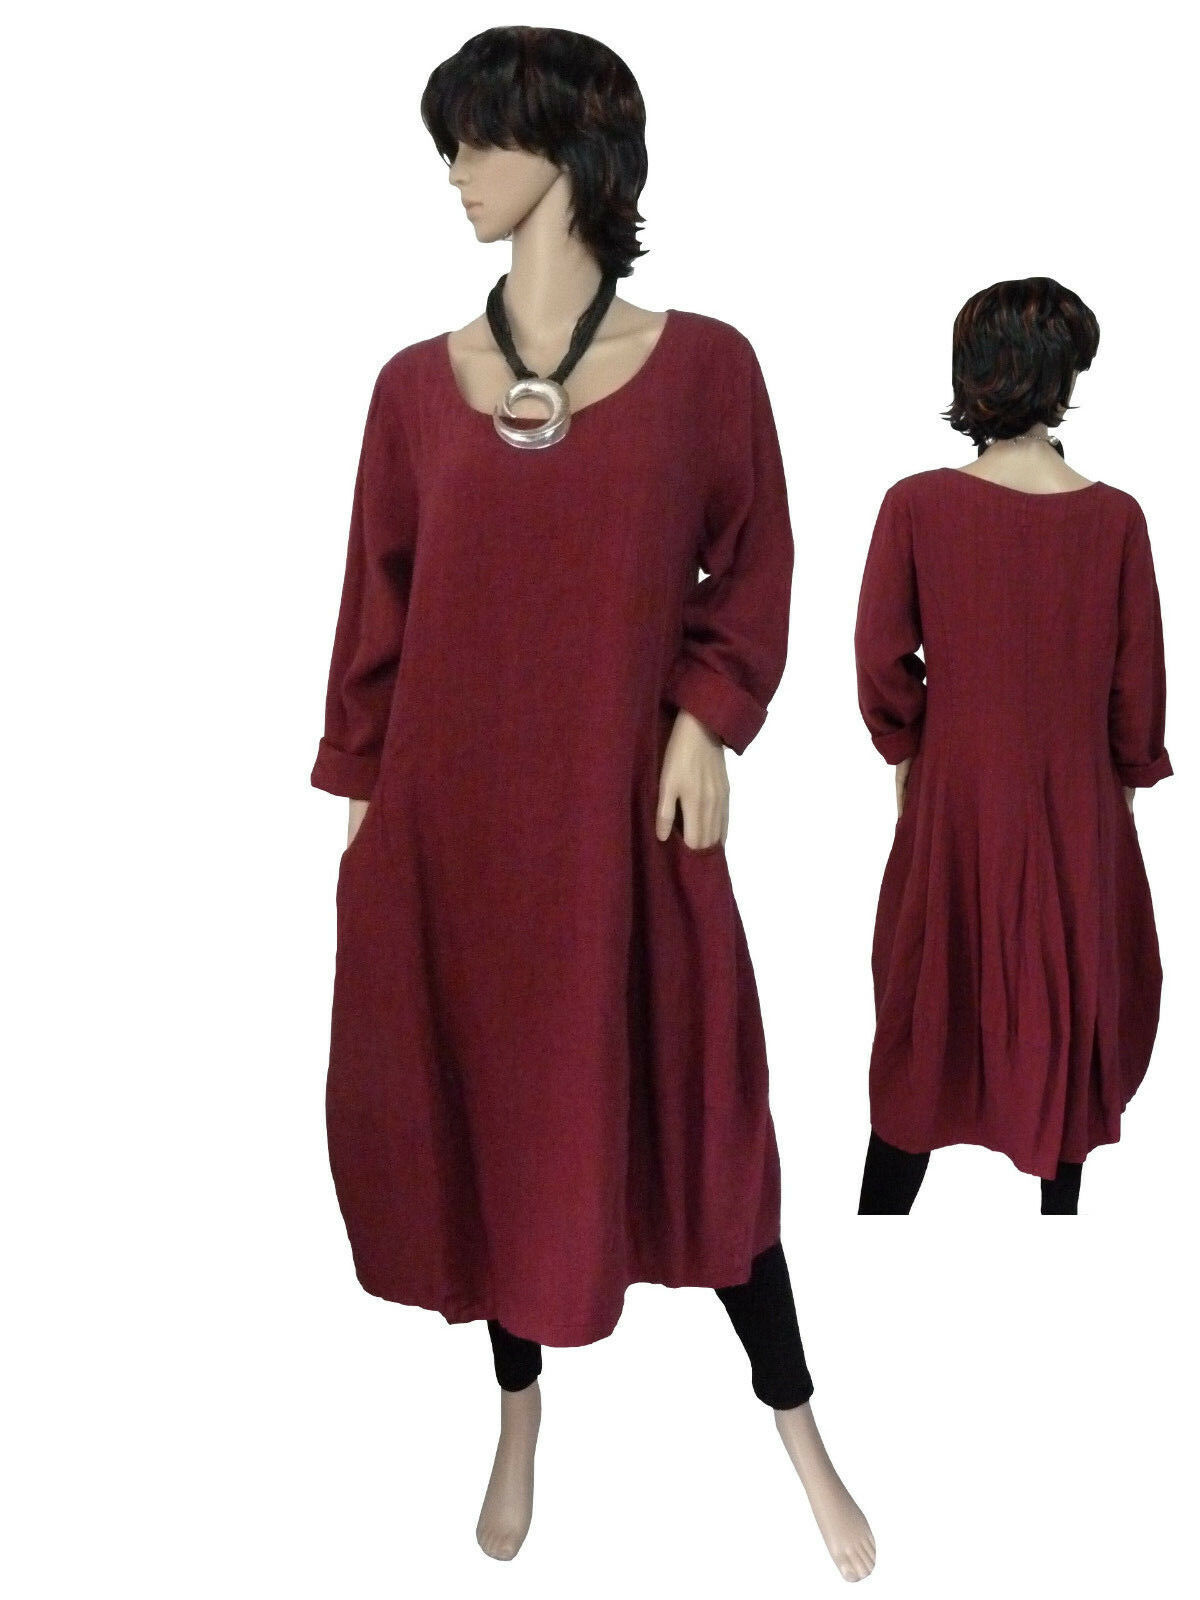 Größe 40 - 50 Robe Lin Robe Manches Longues Robe Ballon Robe Bordeaux Italie Superposé